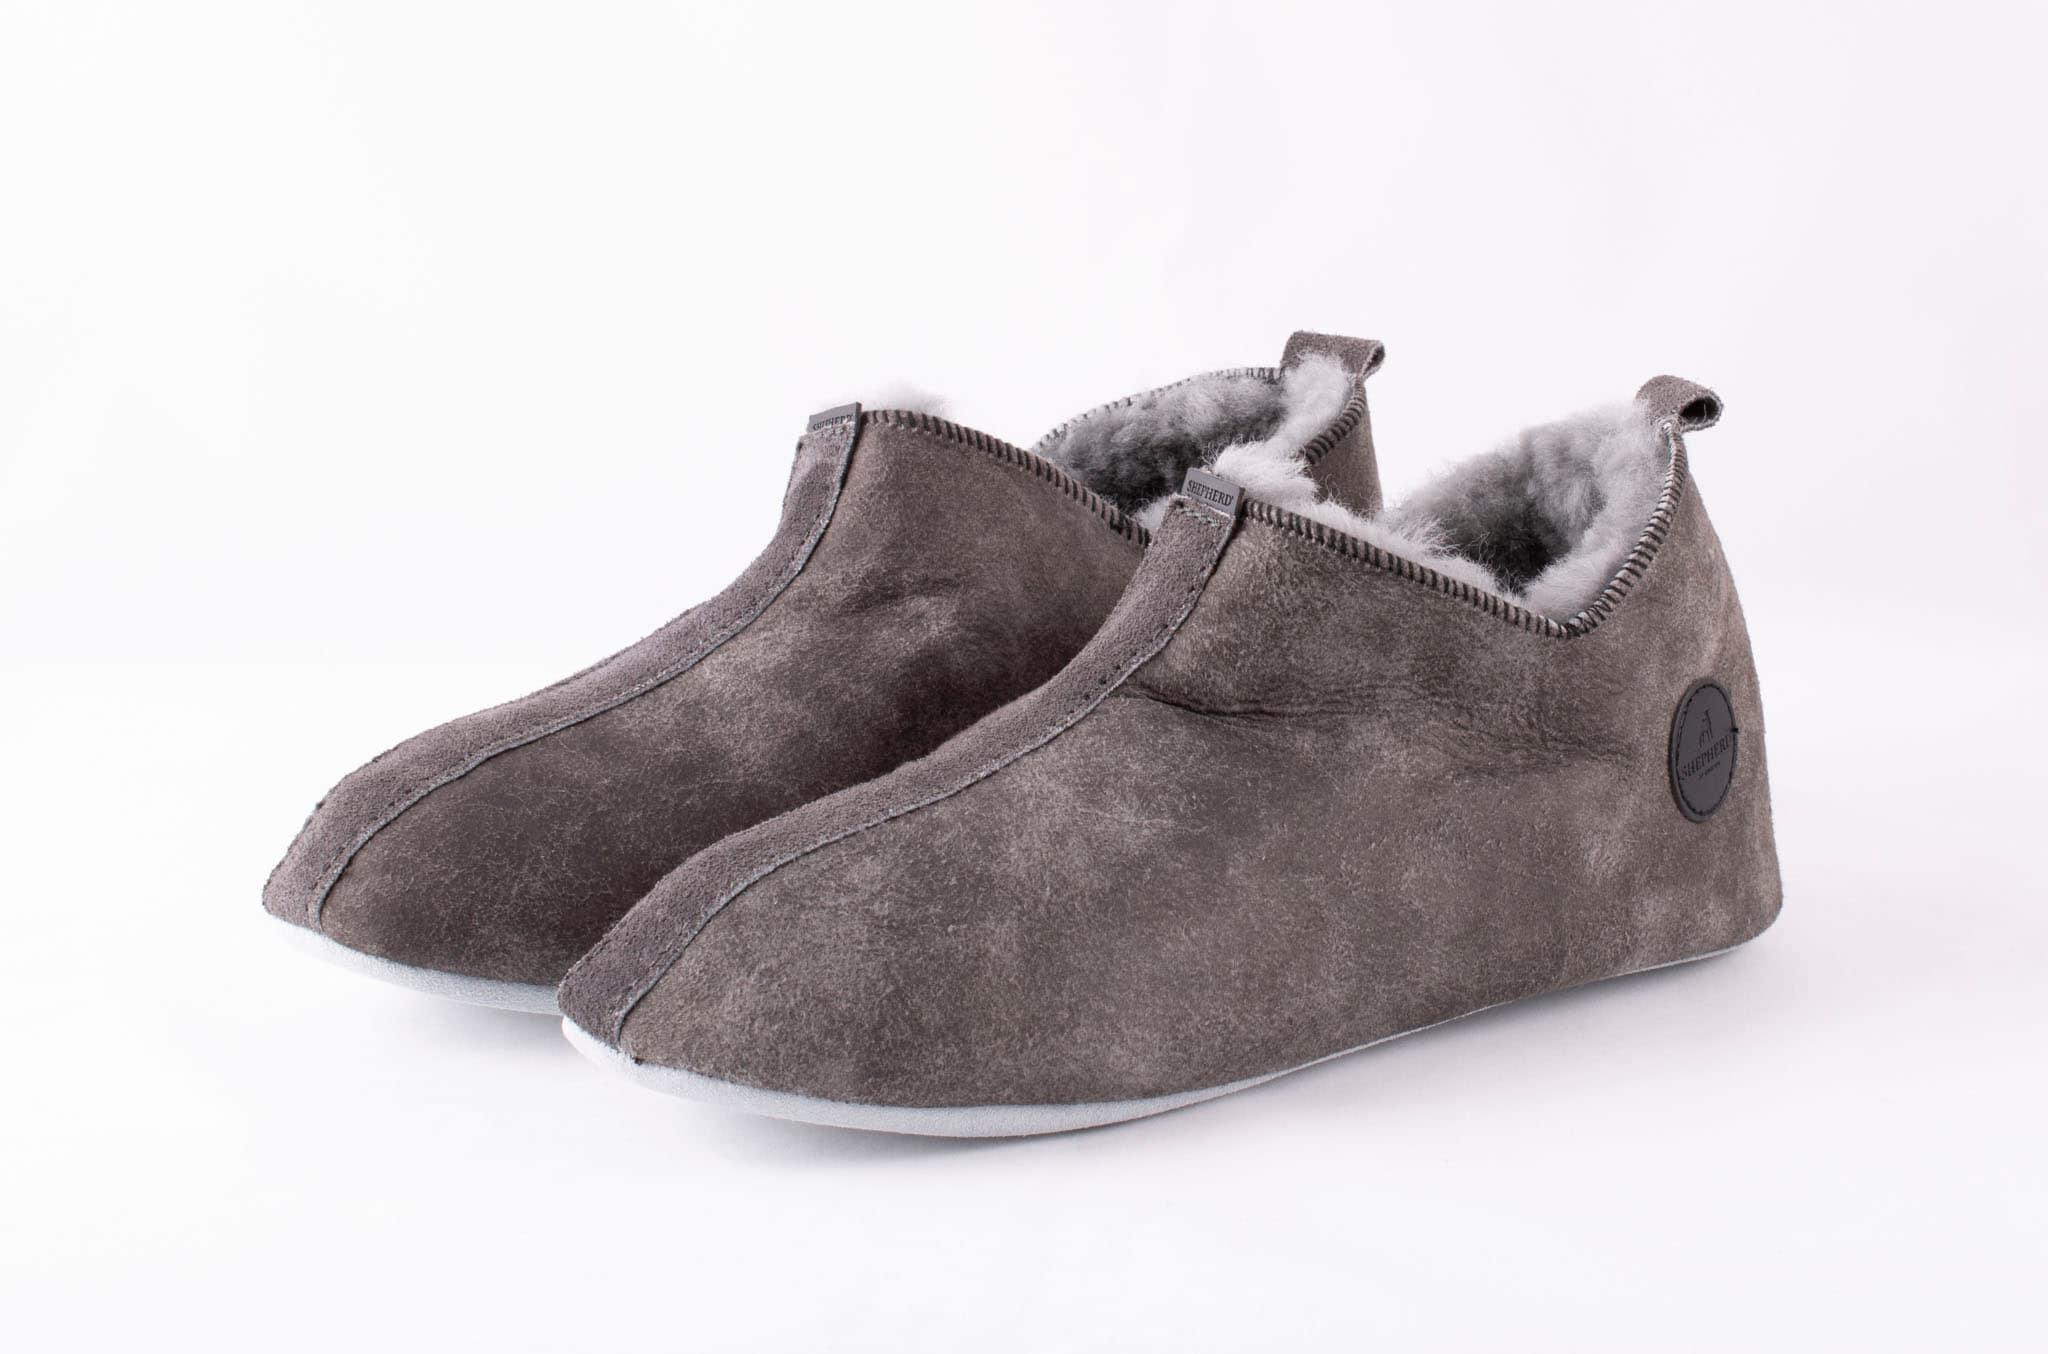 Viared slippers Antique grey